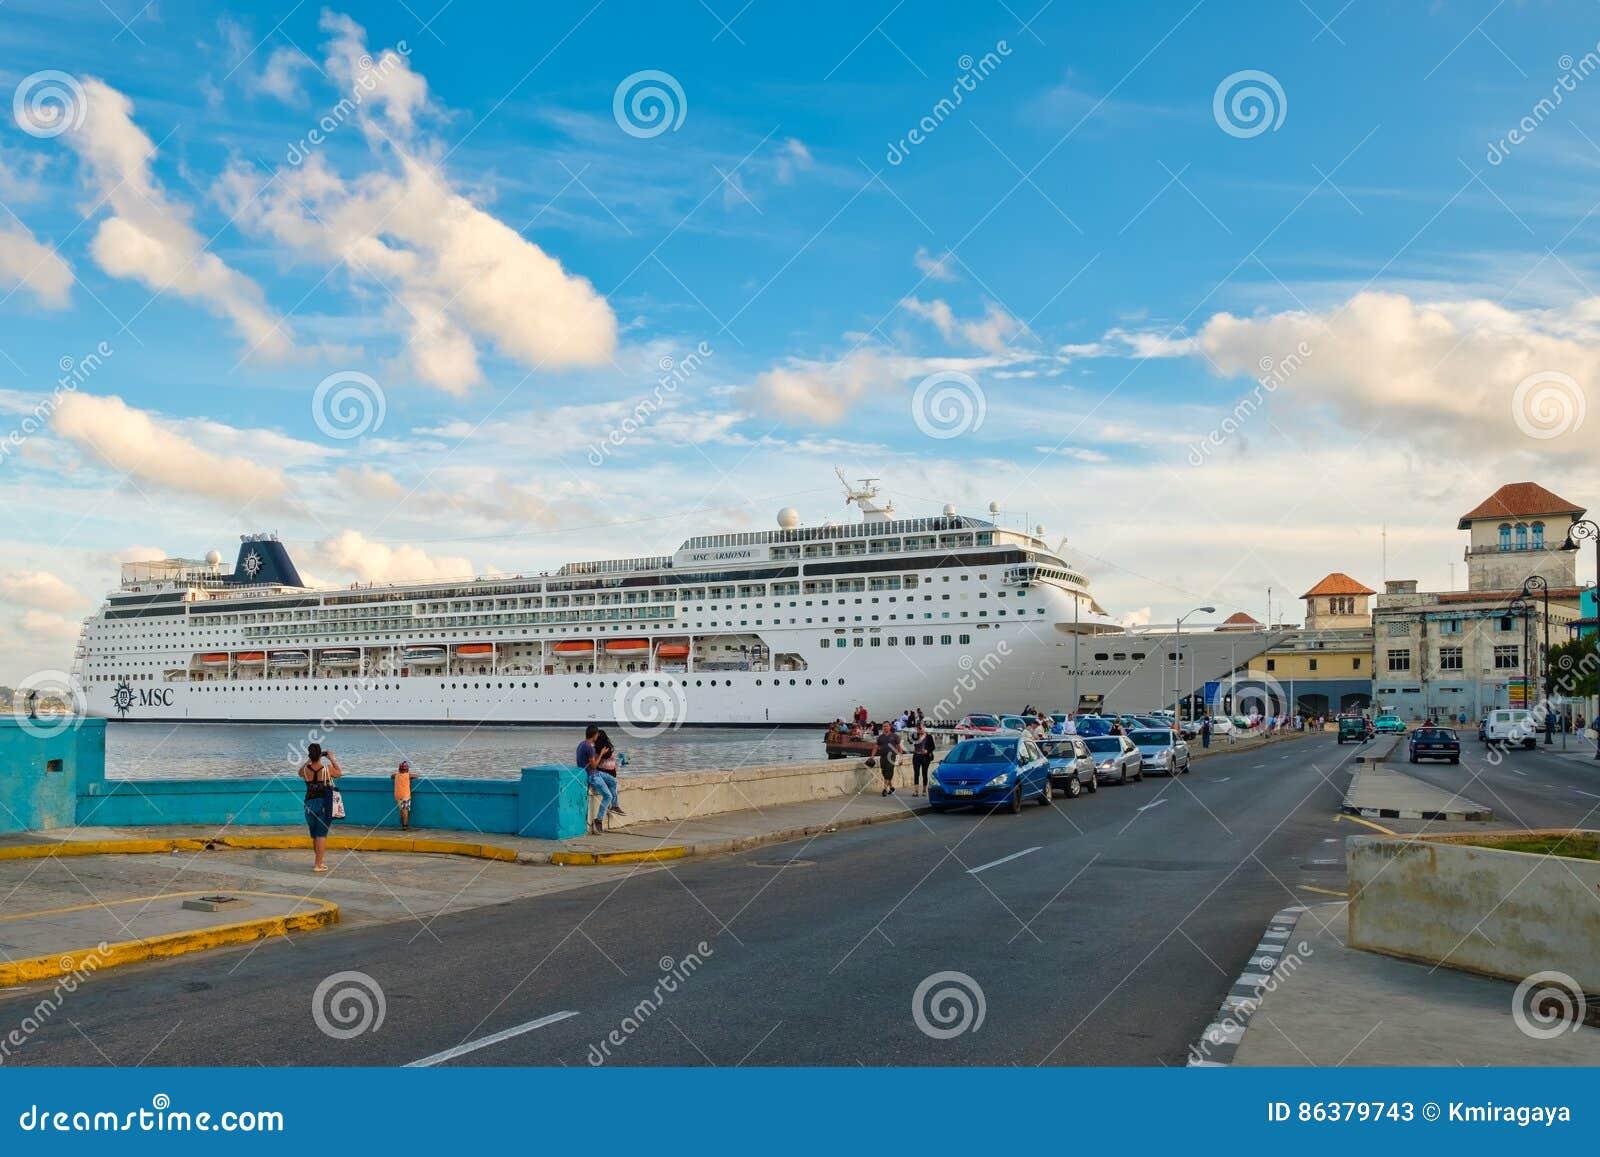 The Modern Cruiser Ship MSC ARMONIA Docked In The Port Of Havana - Msc armonia